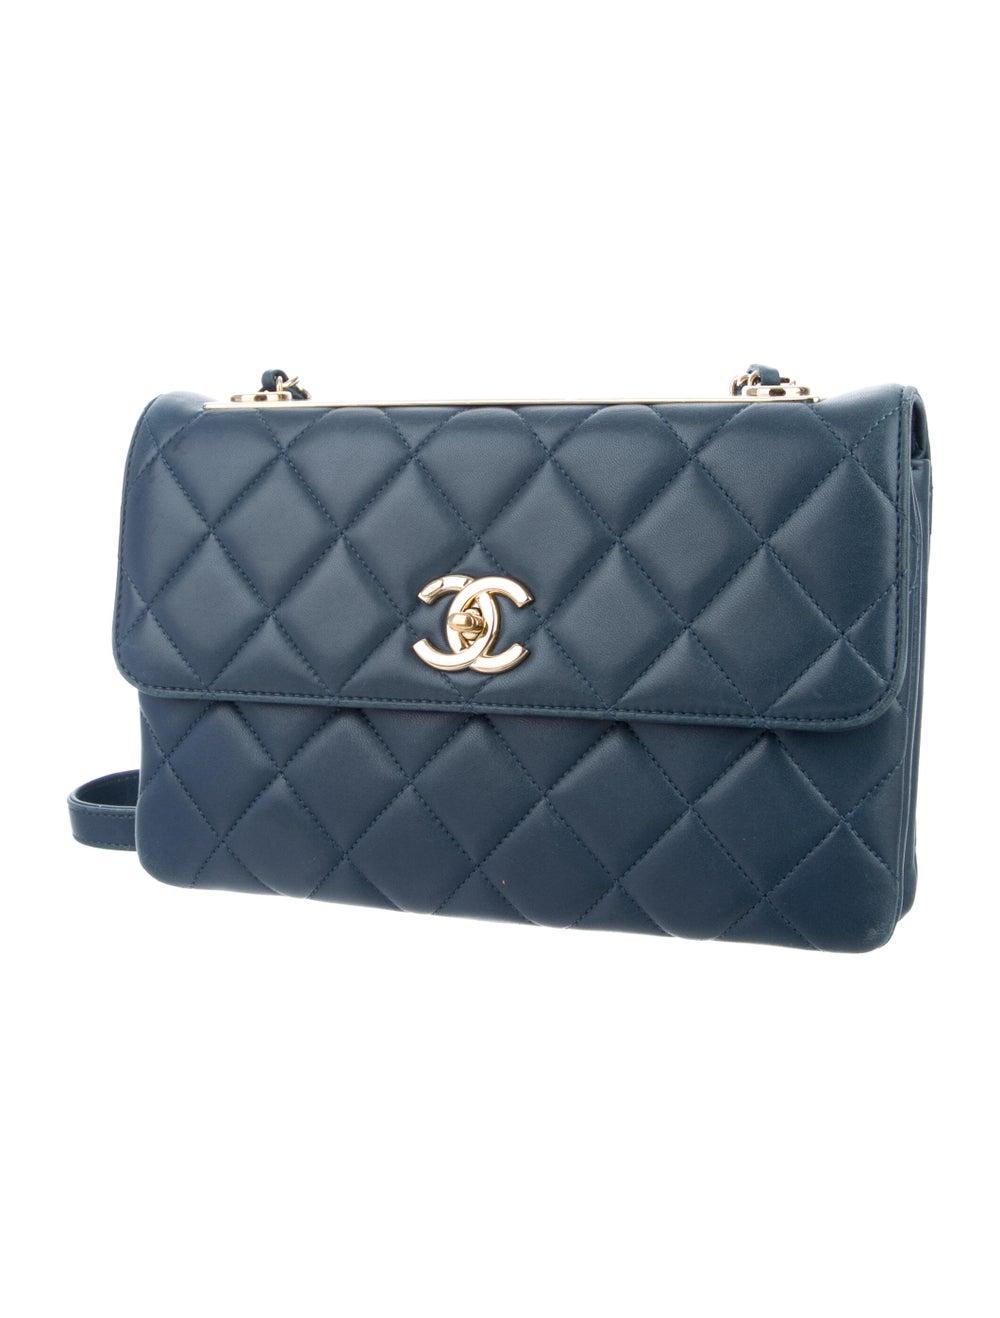 Chanel Trendy CC Flap Bag Blue - image 3